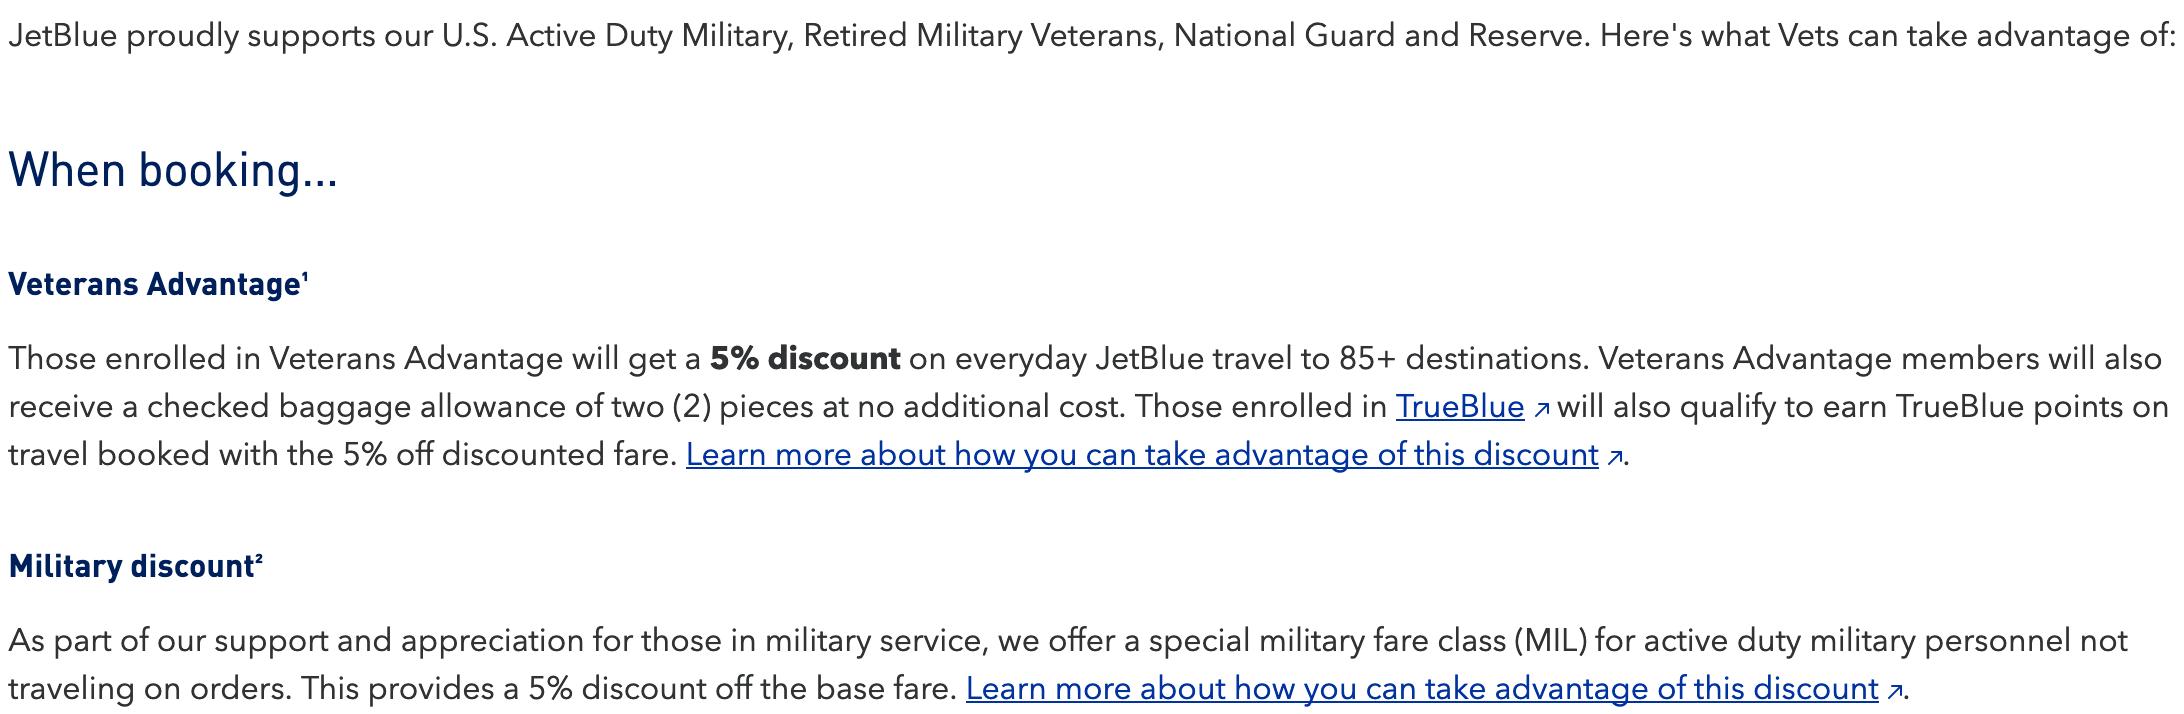 JetBlue Military Veteran Discounts